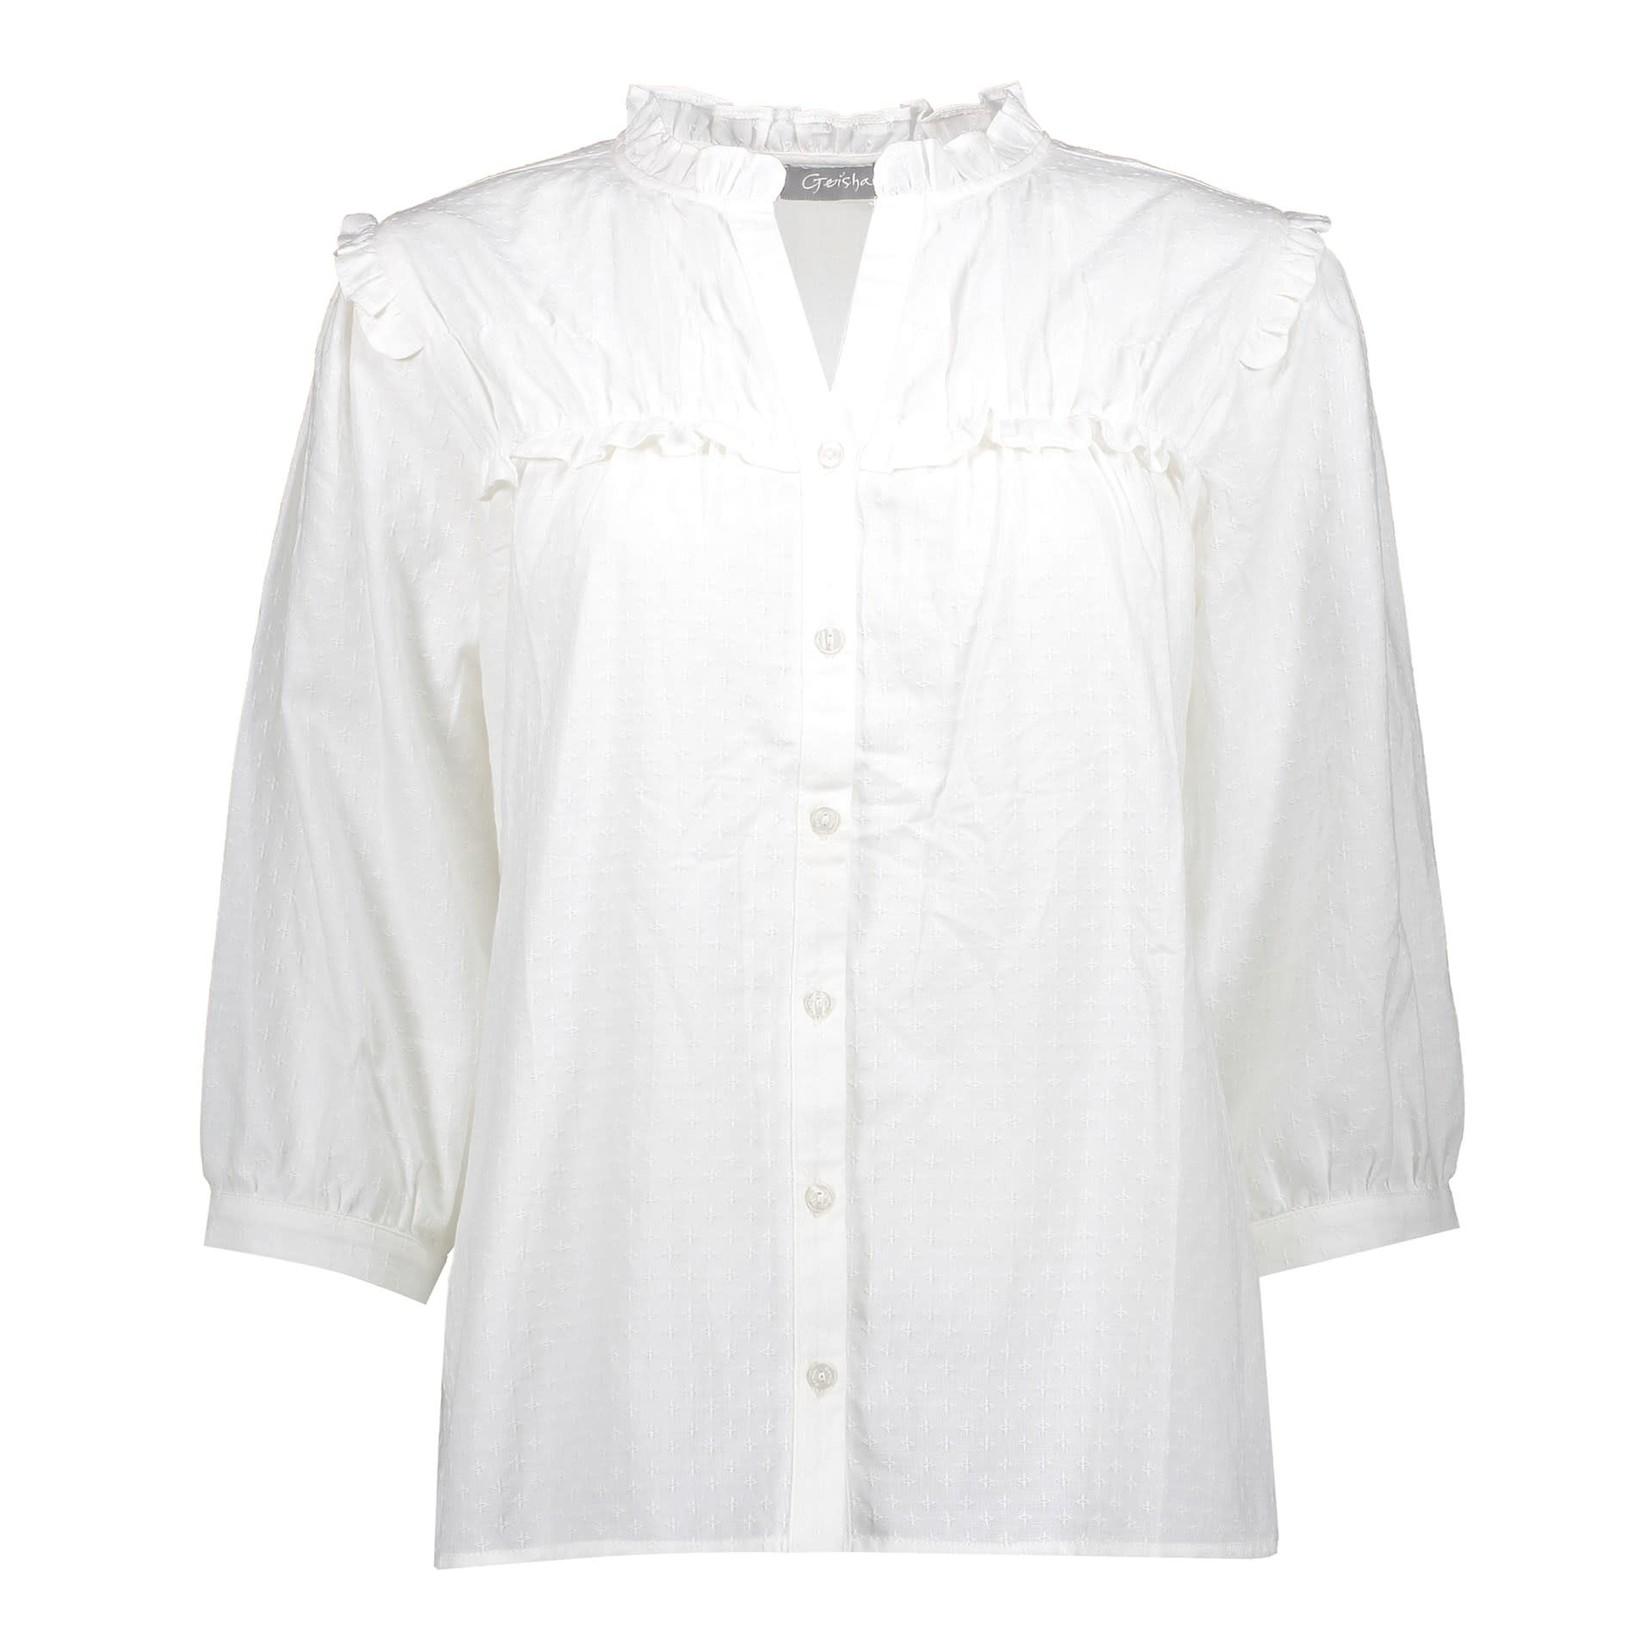 Geisha Geisha blouse off-white 13204-20